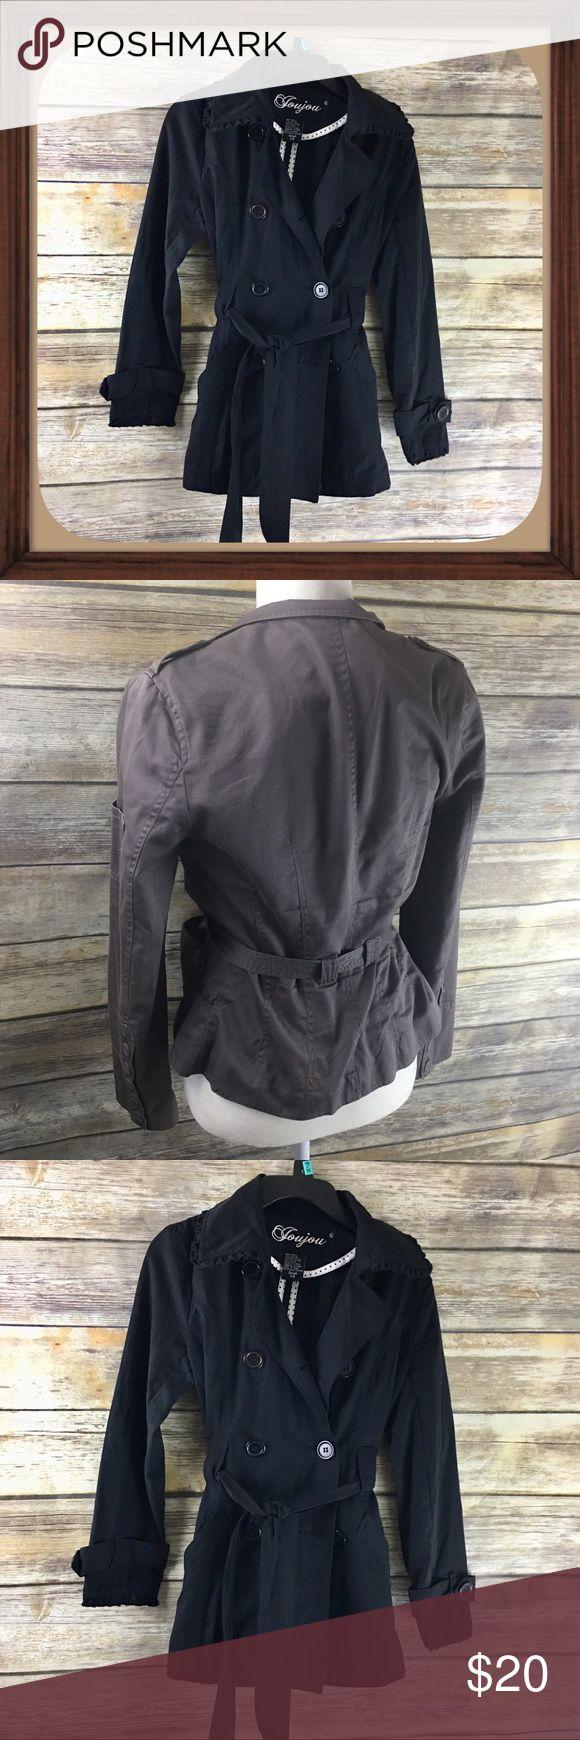 Best 25 Black Trench Coats Ideas On Pinterest  Burberry -8029